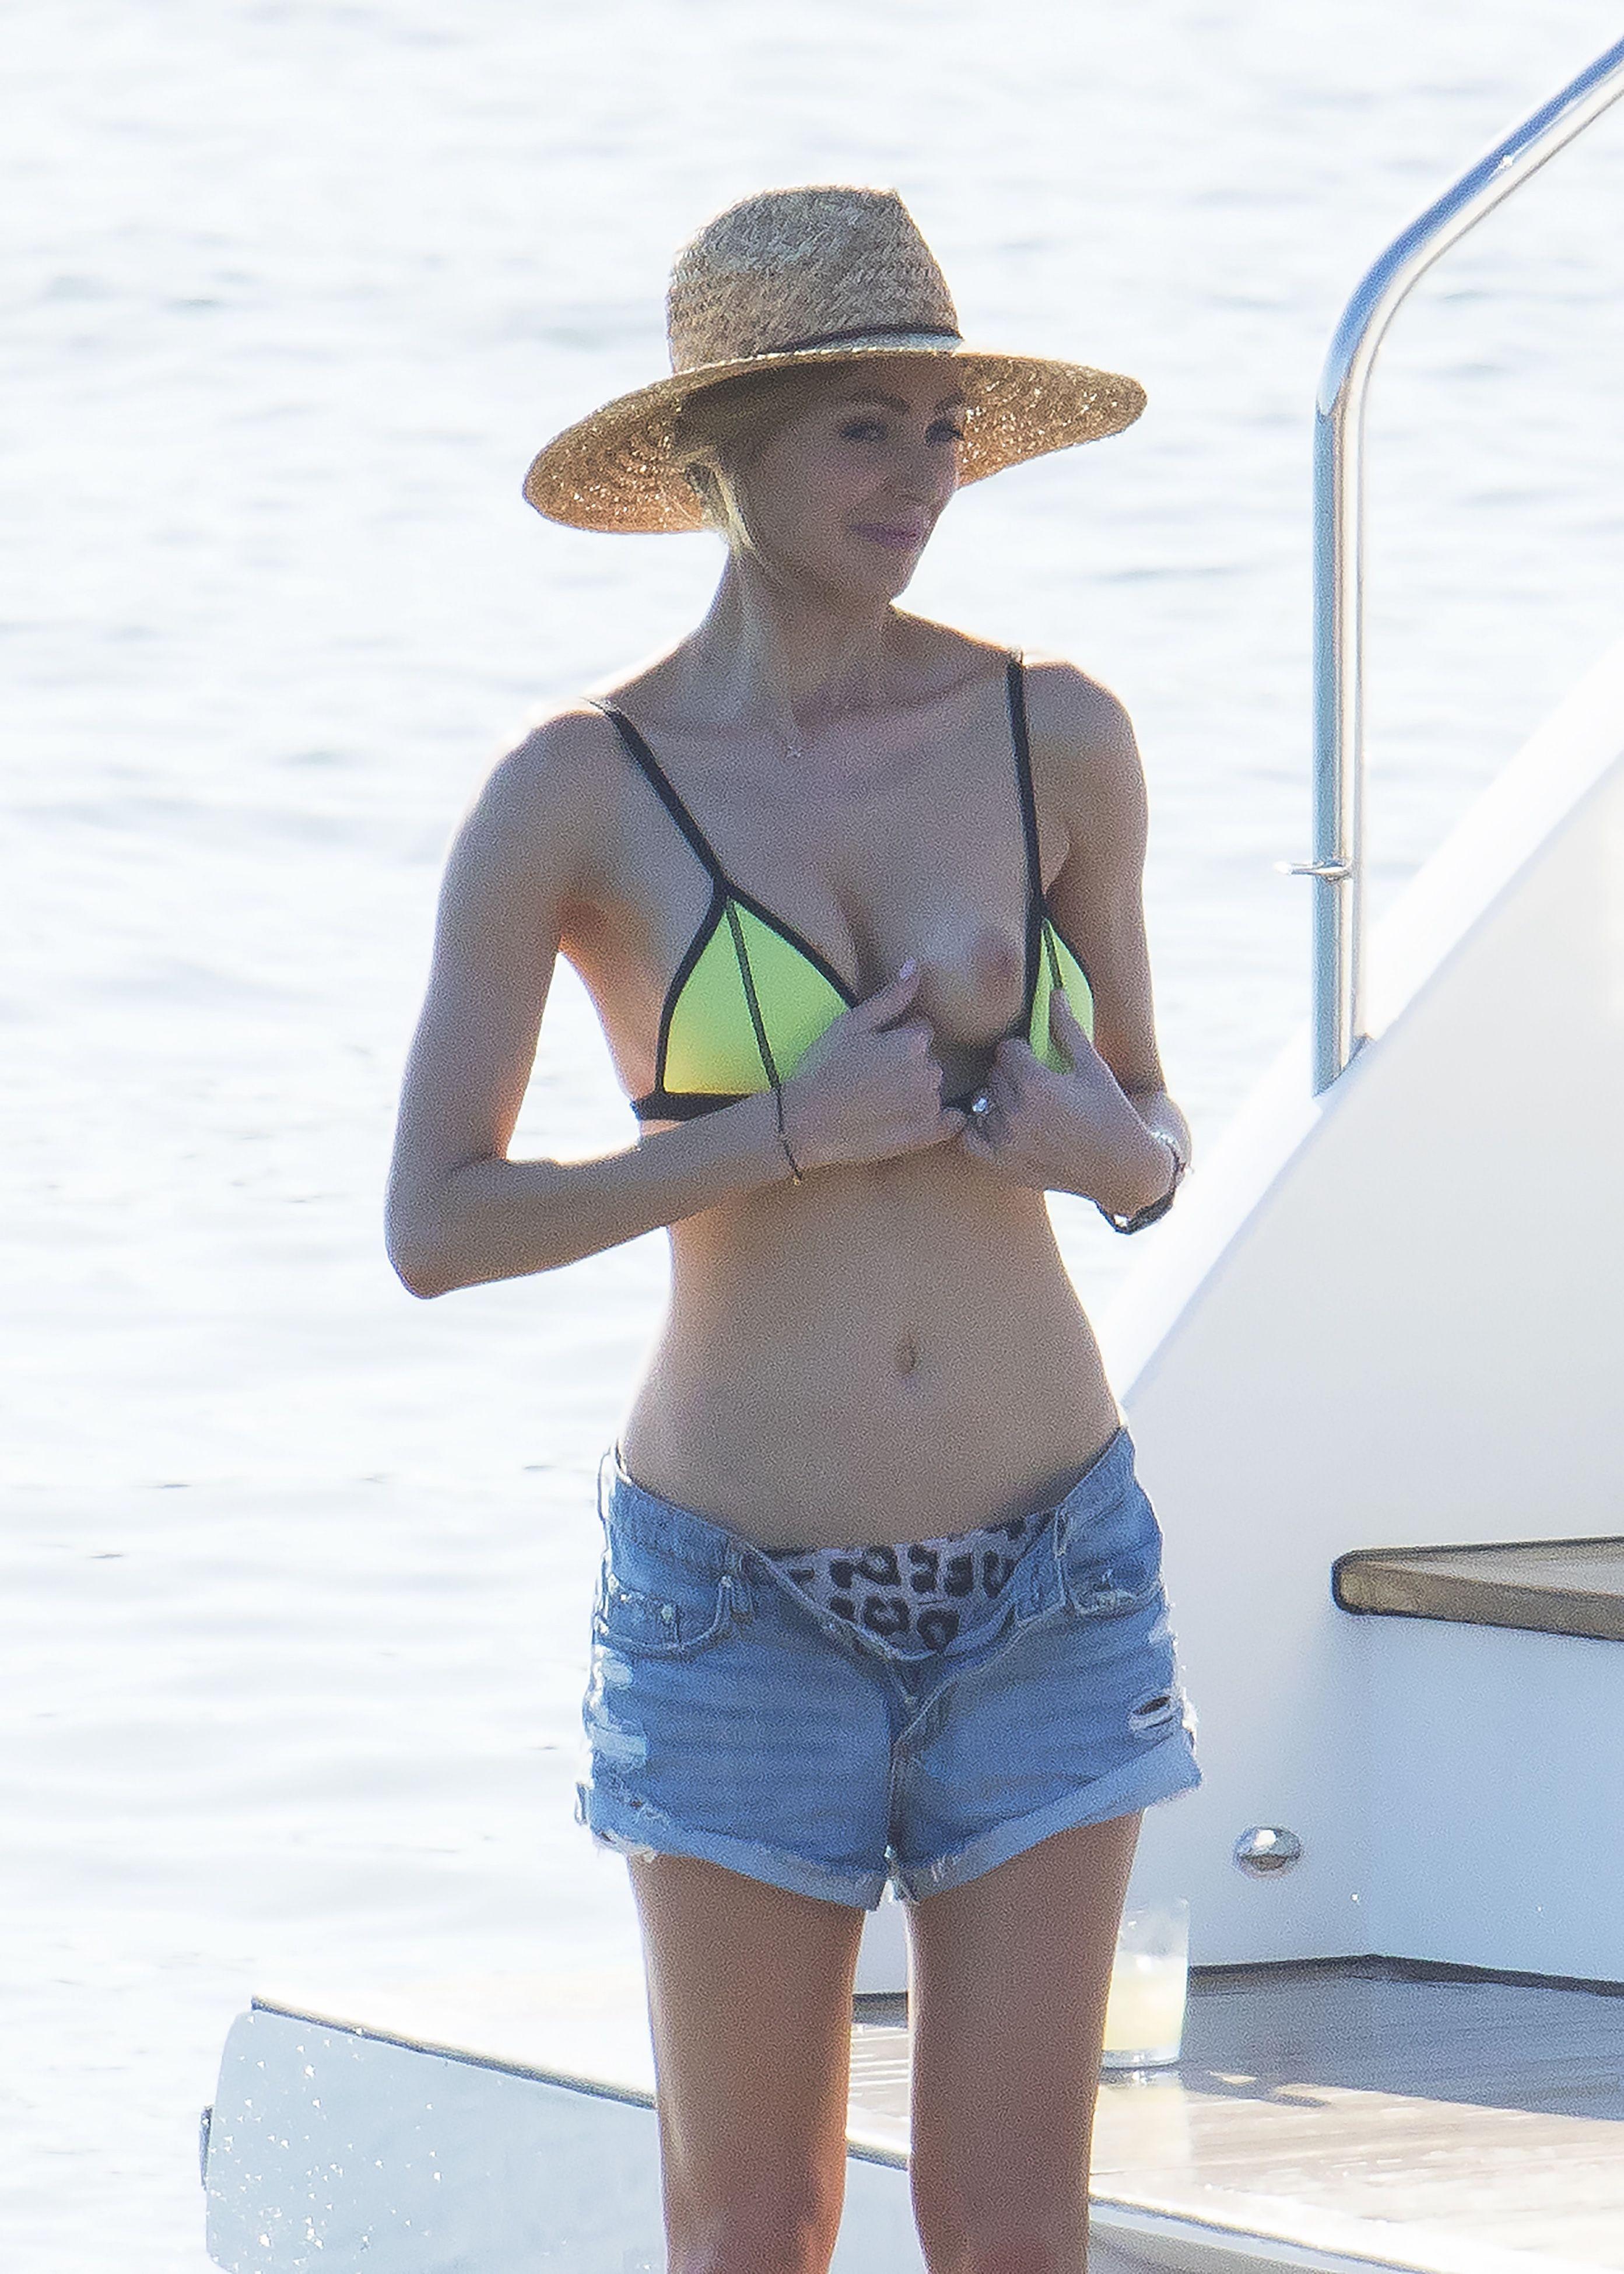 Jennifer hawkins nude the fappening